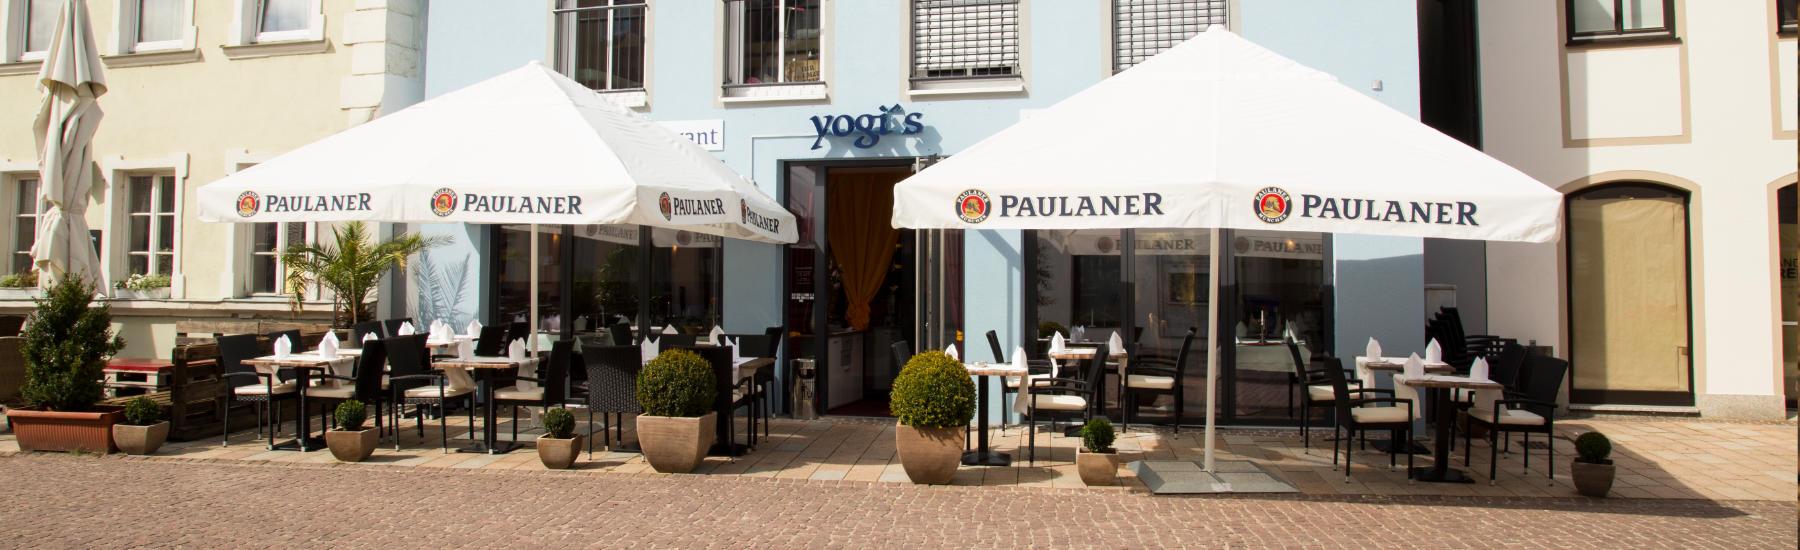 yogis-restaurant-1